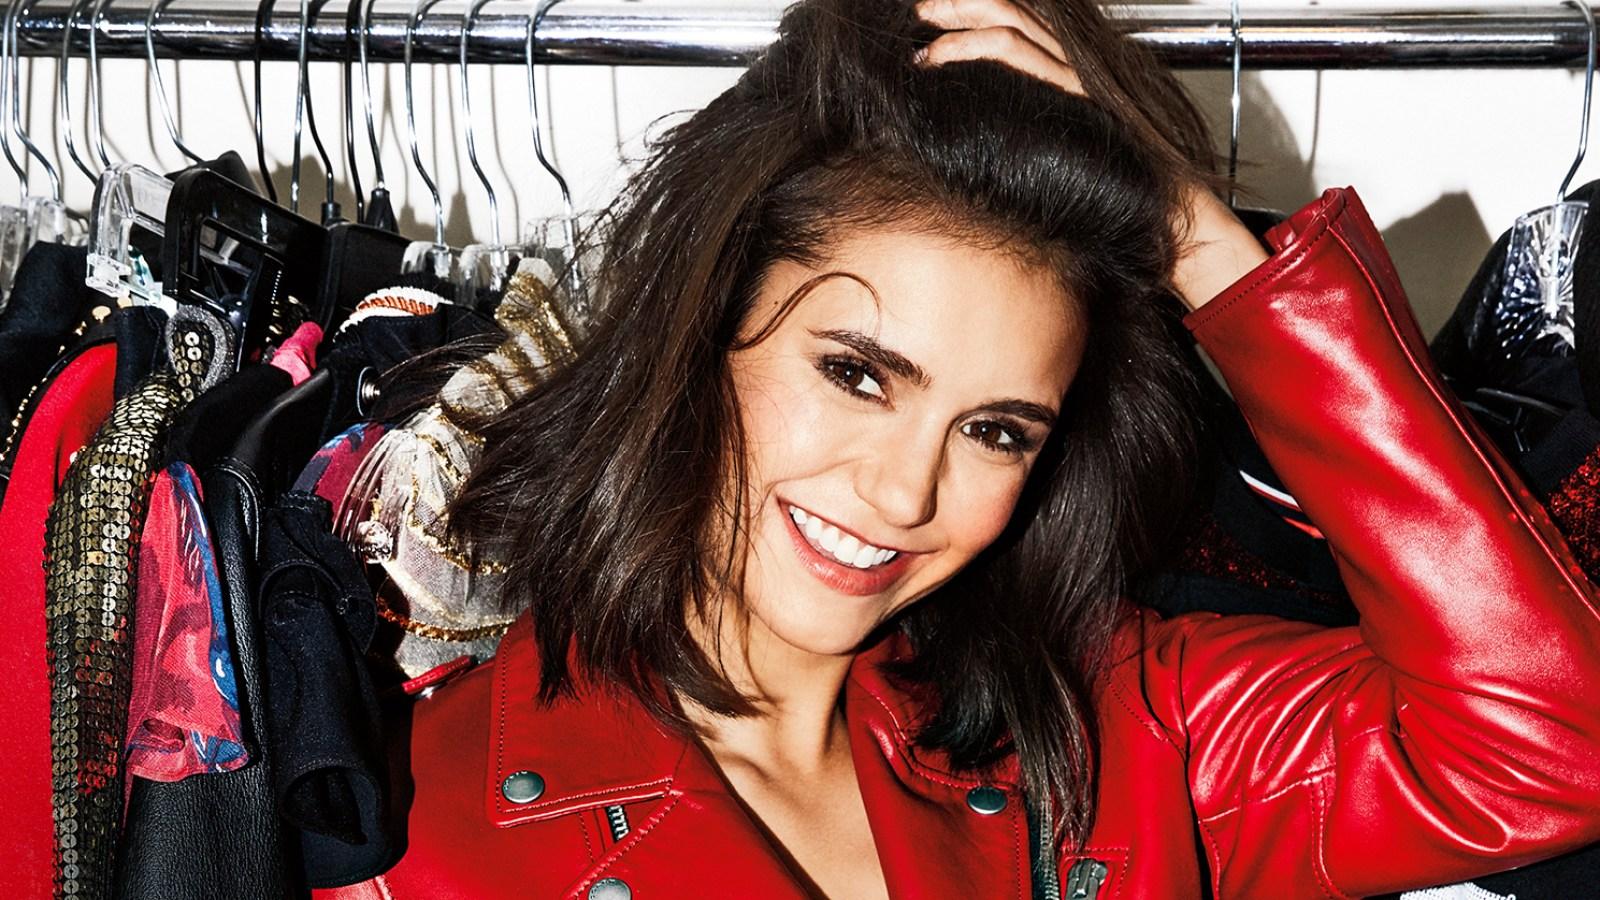 Nina Dobrev Explains Why She Exited 'The Vampire Diaries'